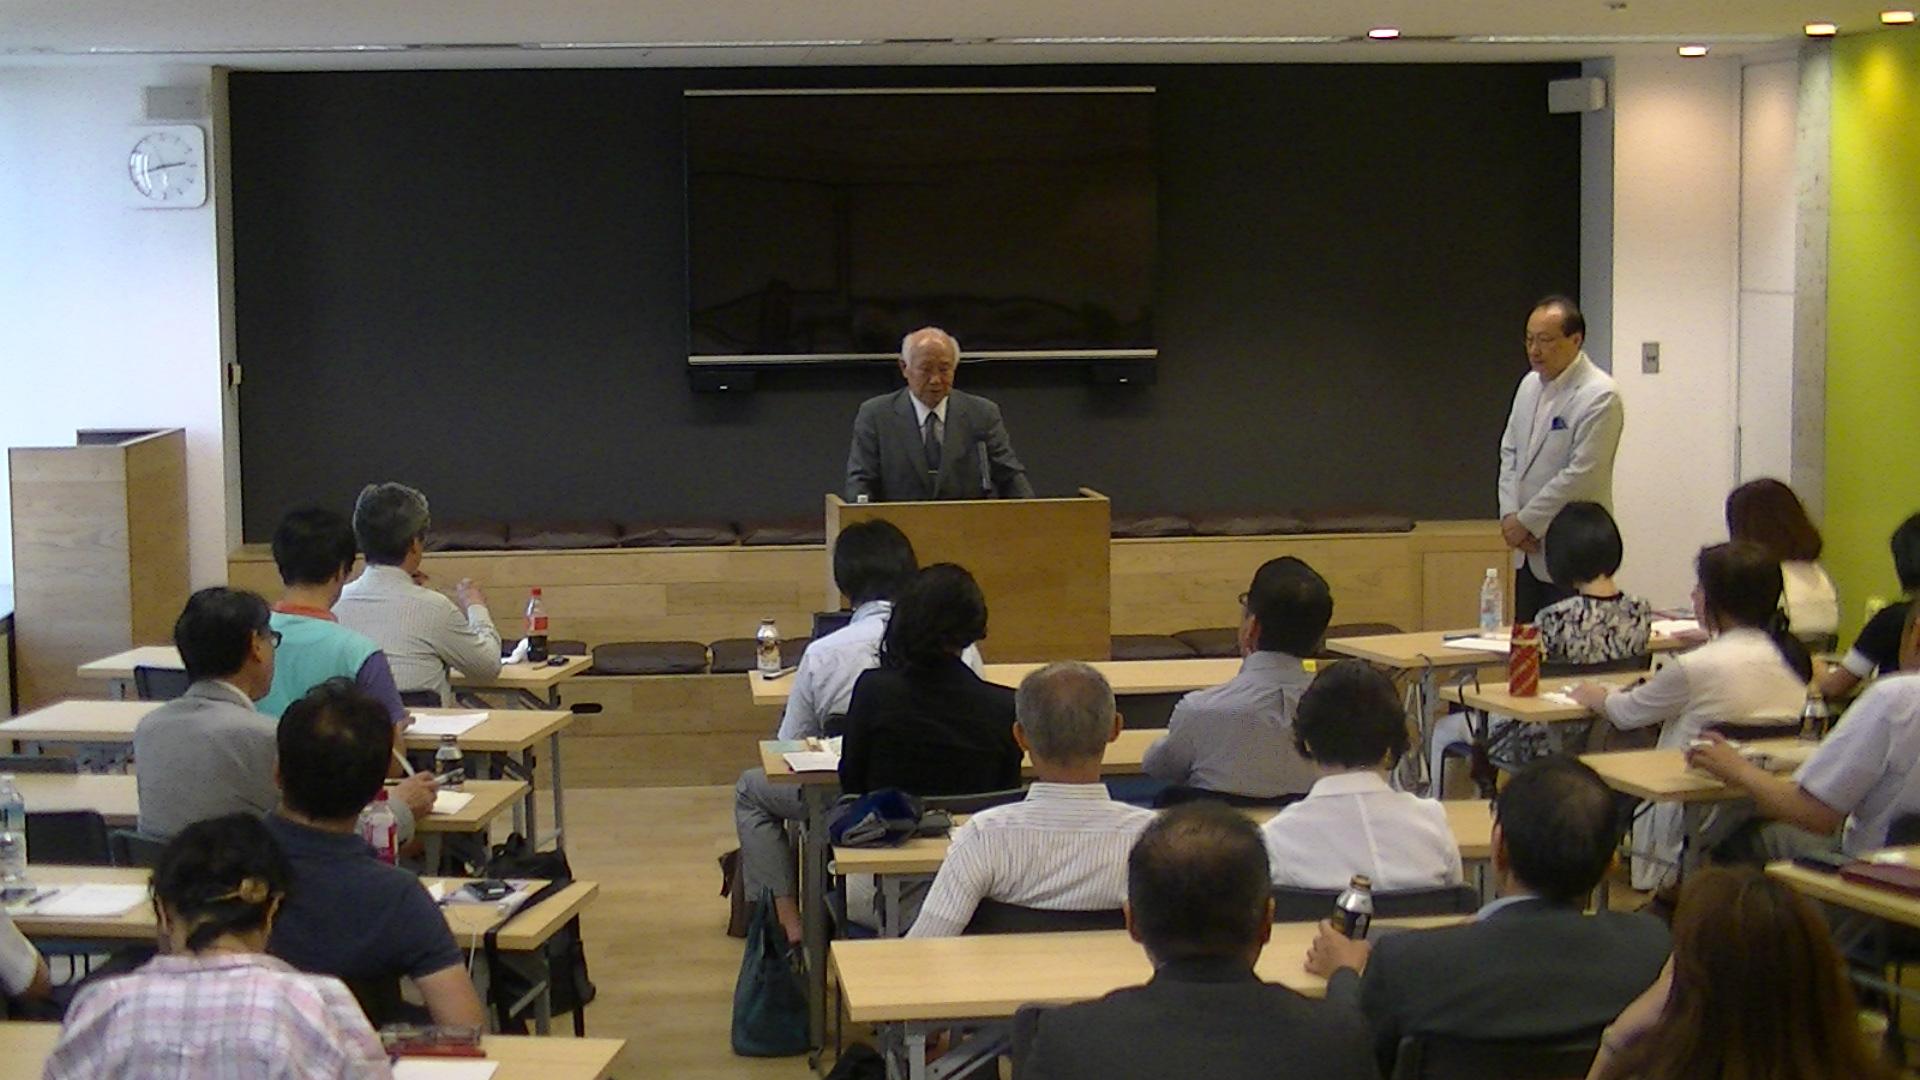 PIC 0623 - 4月1日東京思風塾の開催になります。